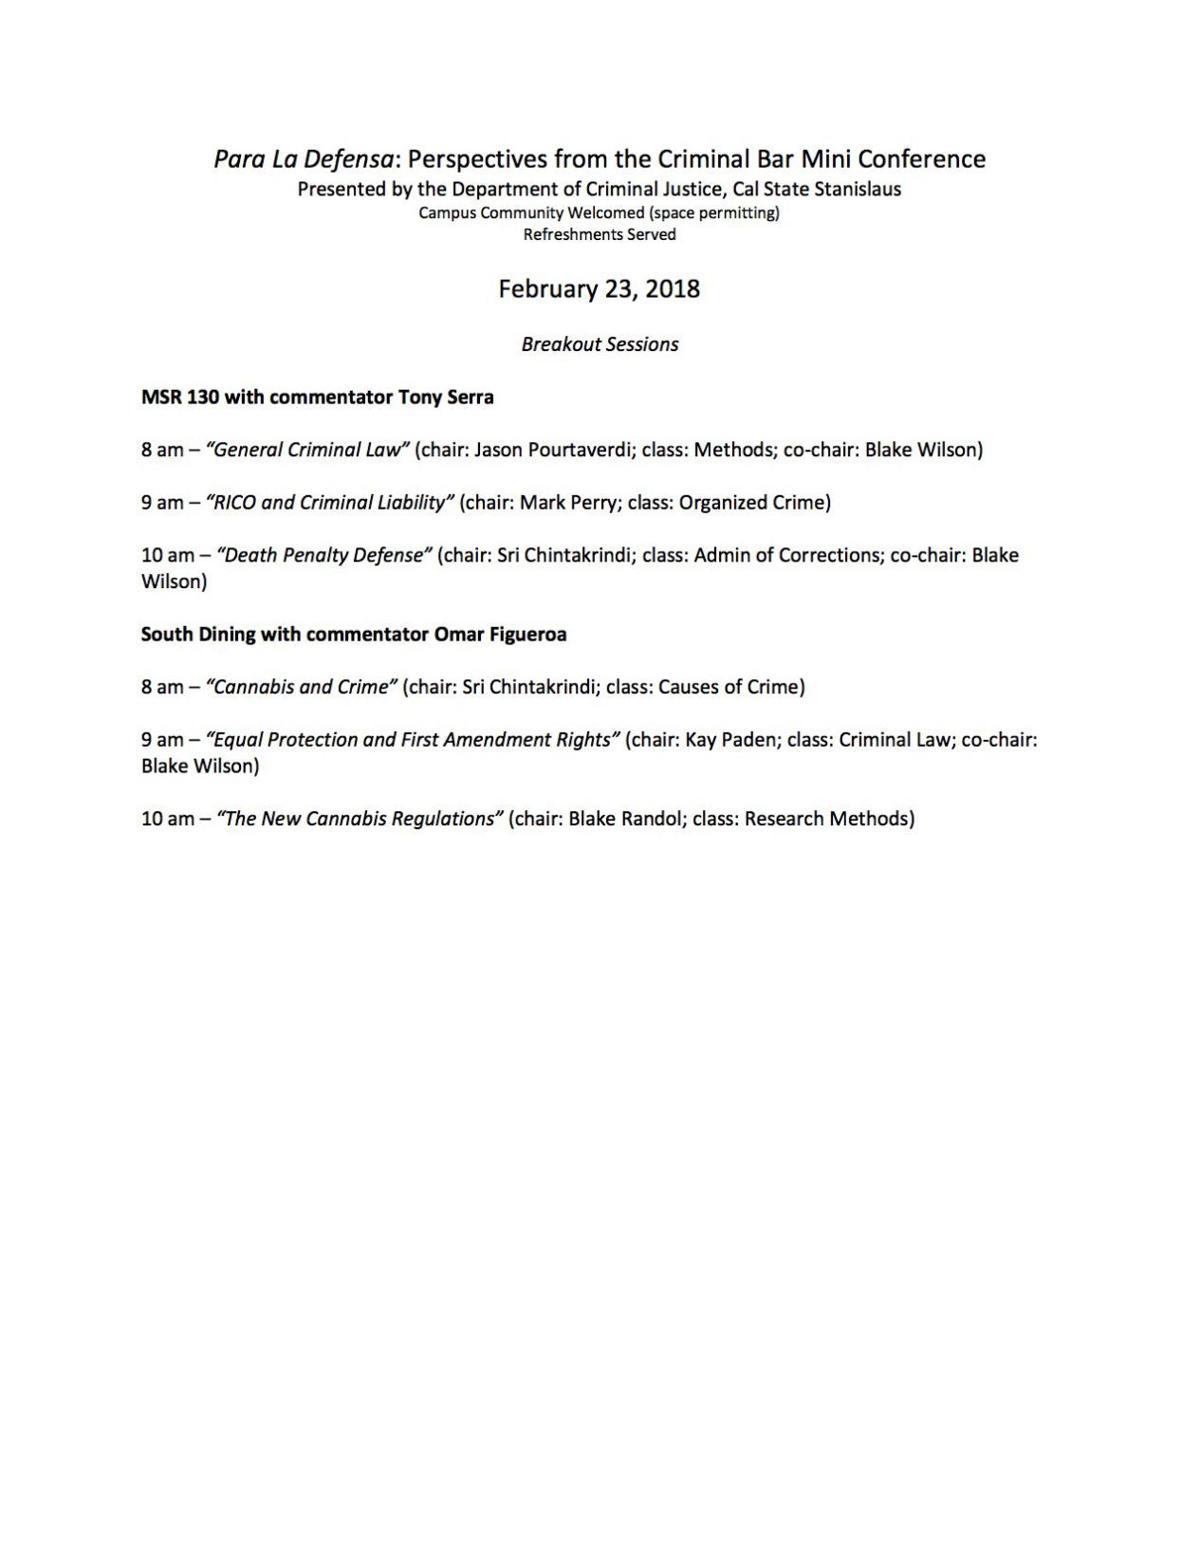 Mini Conferences for Para la Defensa